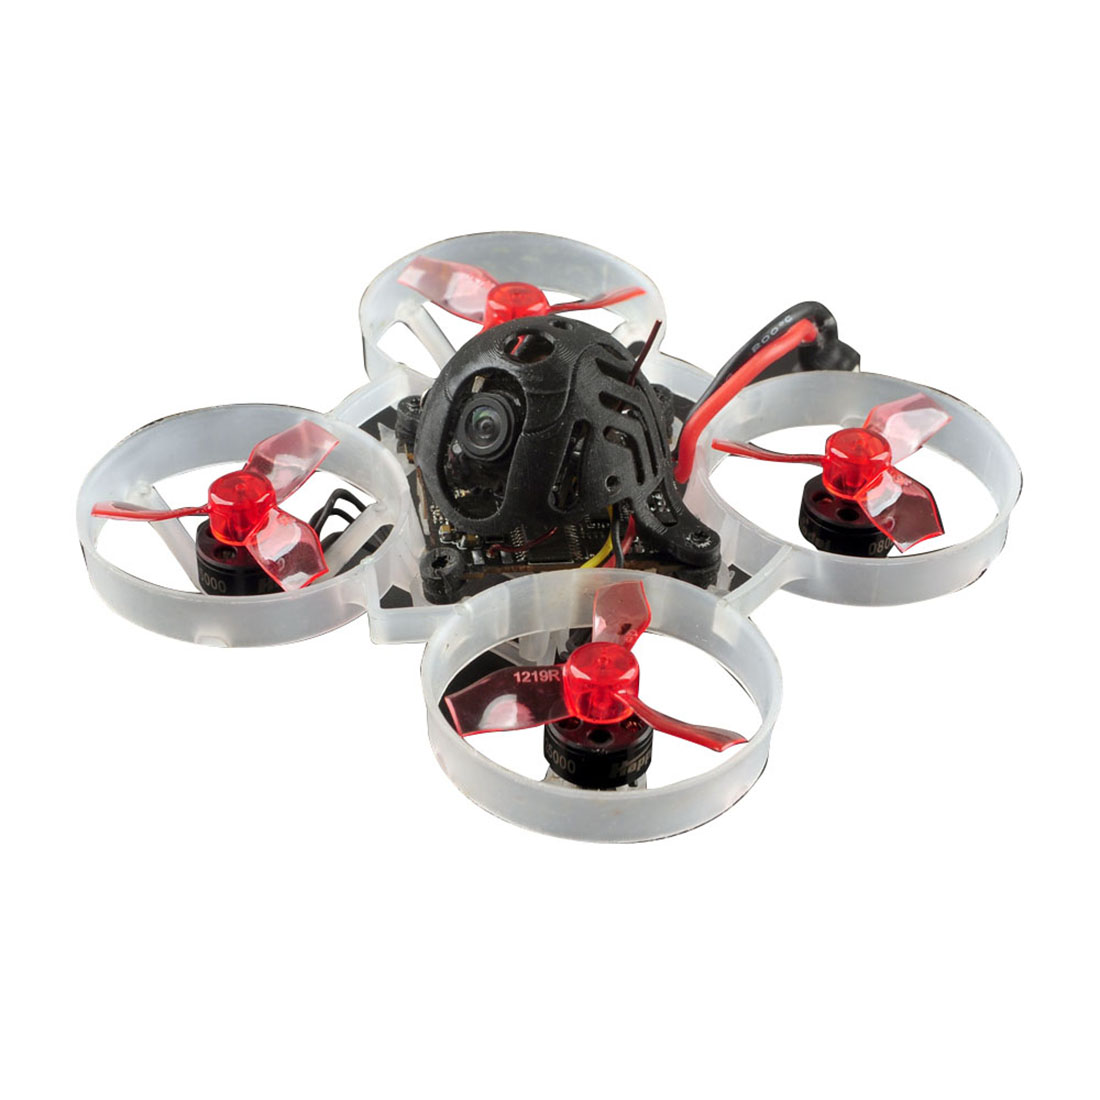 Happymodel Mobula6 Mobula 6 1S 65 Mm Borstelloze Bwhoop Fpv Racing Drone Met 4in1 Crazybee F4 Lite Runcam Nano3 preorder Rc Dron 2